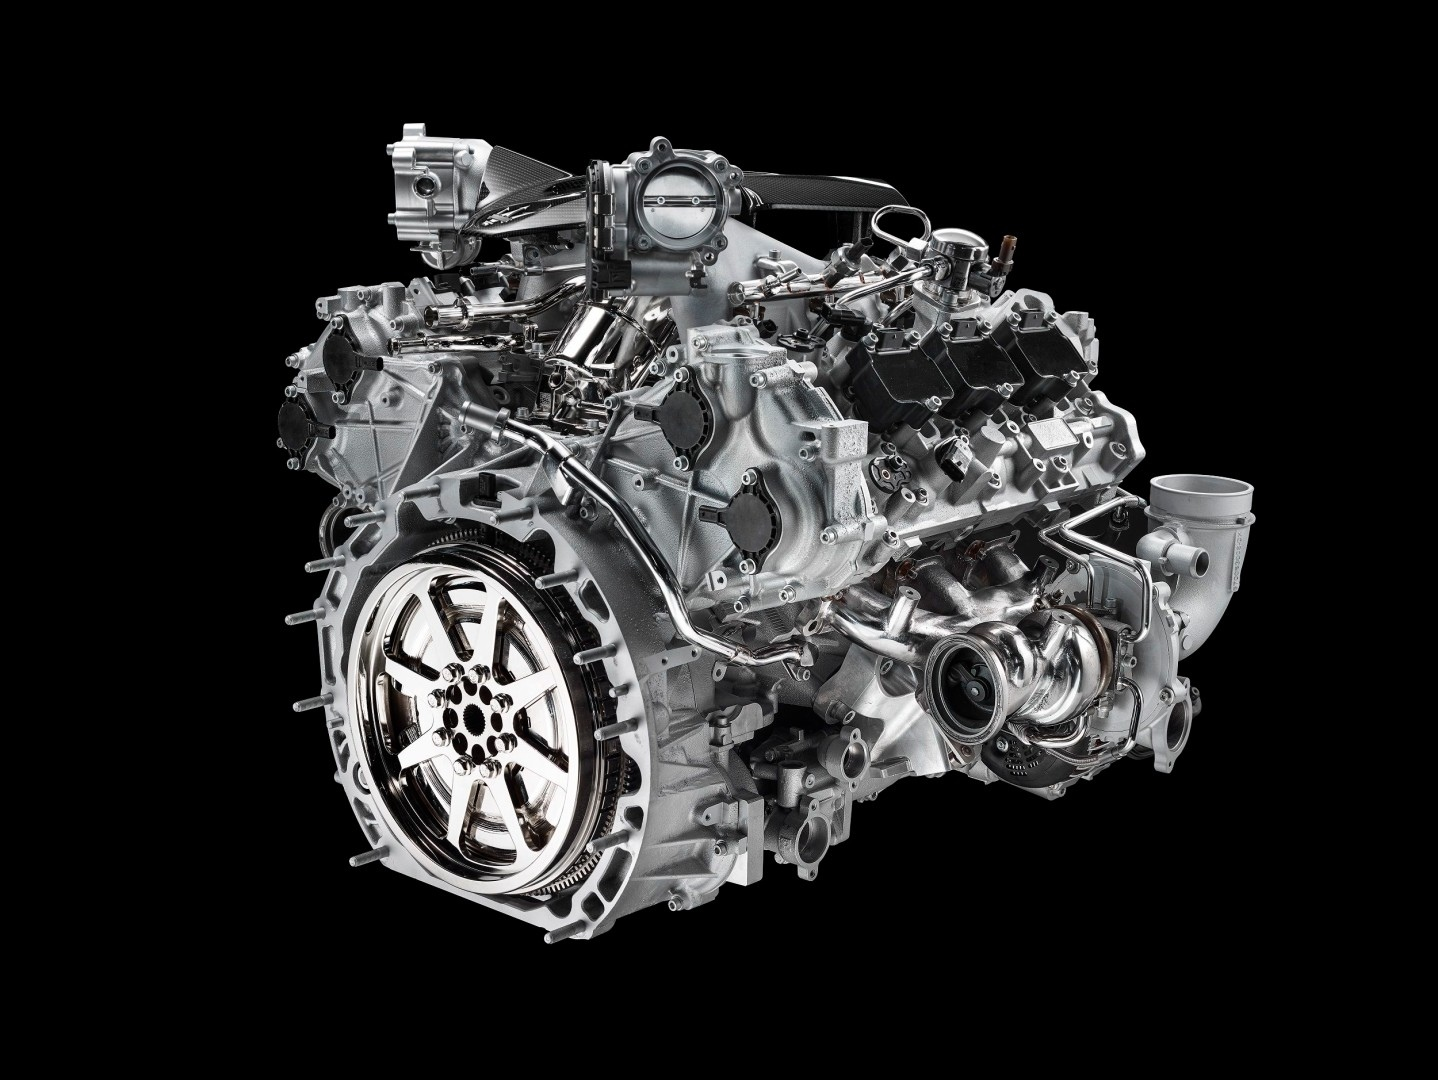 maserati nettuno v6 motor (6)